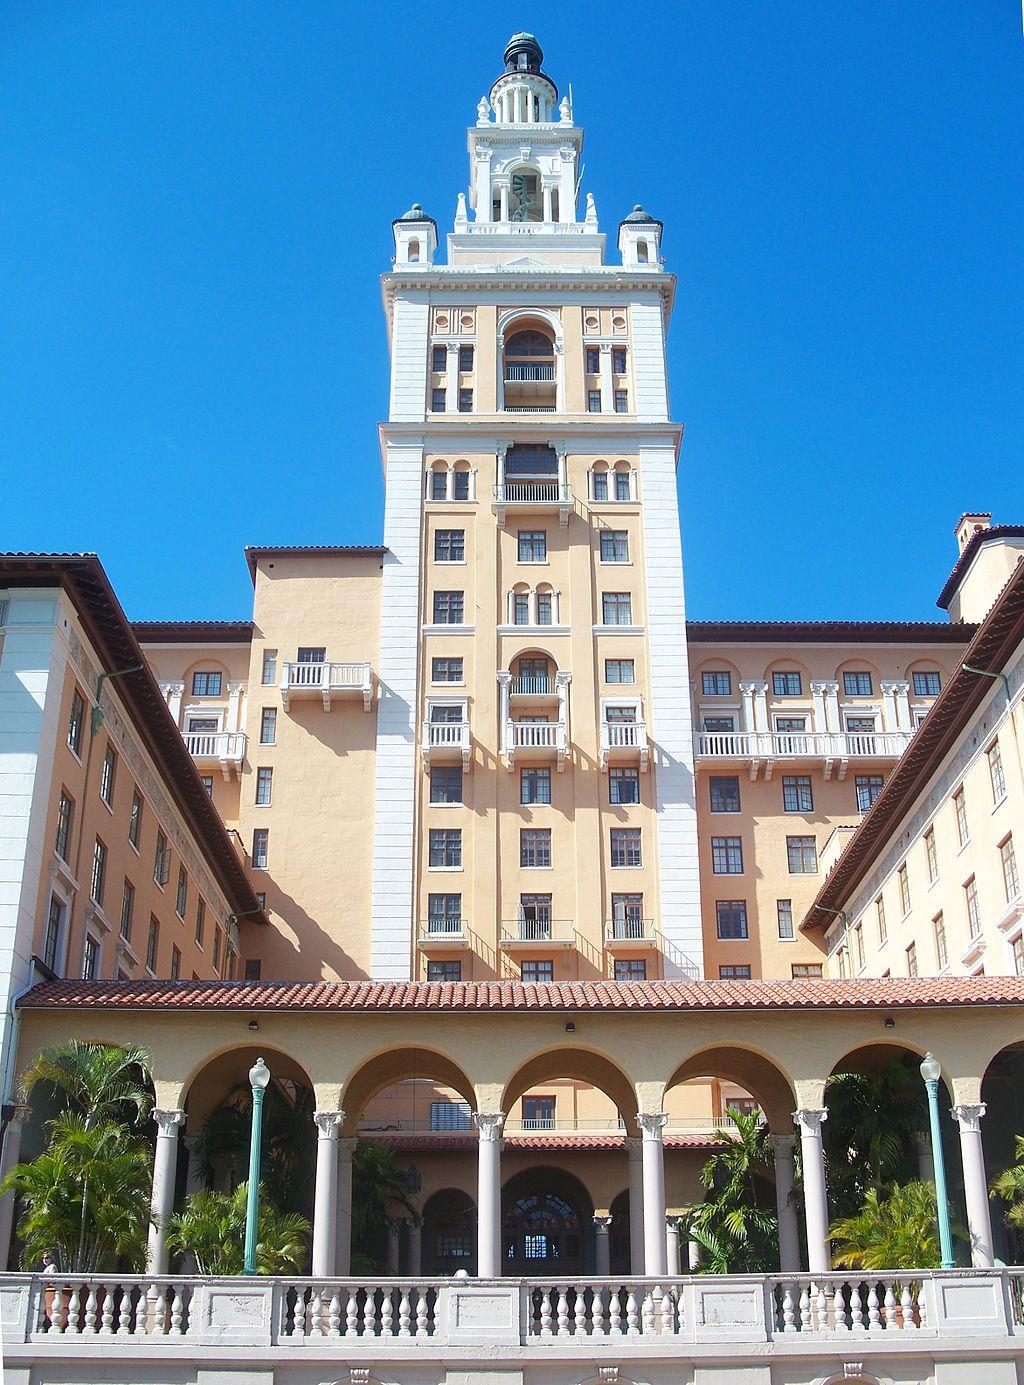 Scenic View of Biltmore Hotel